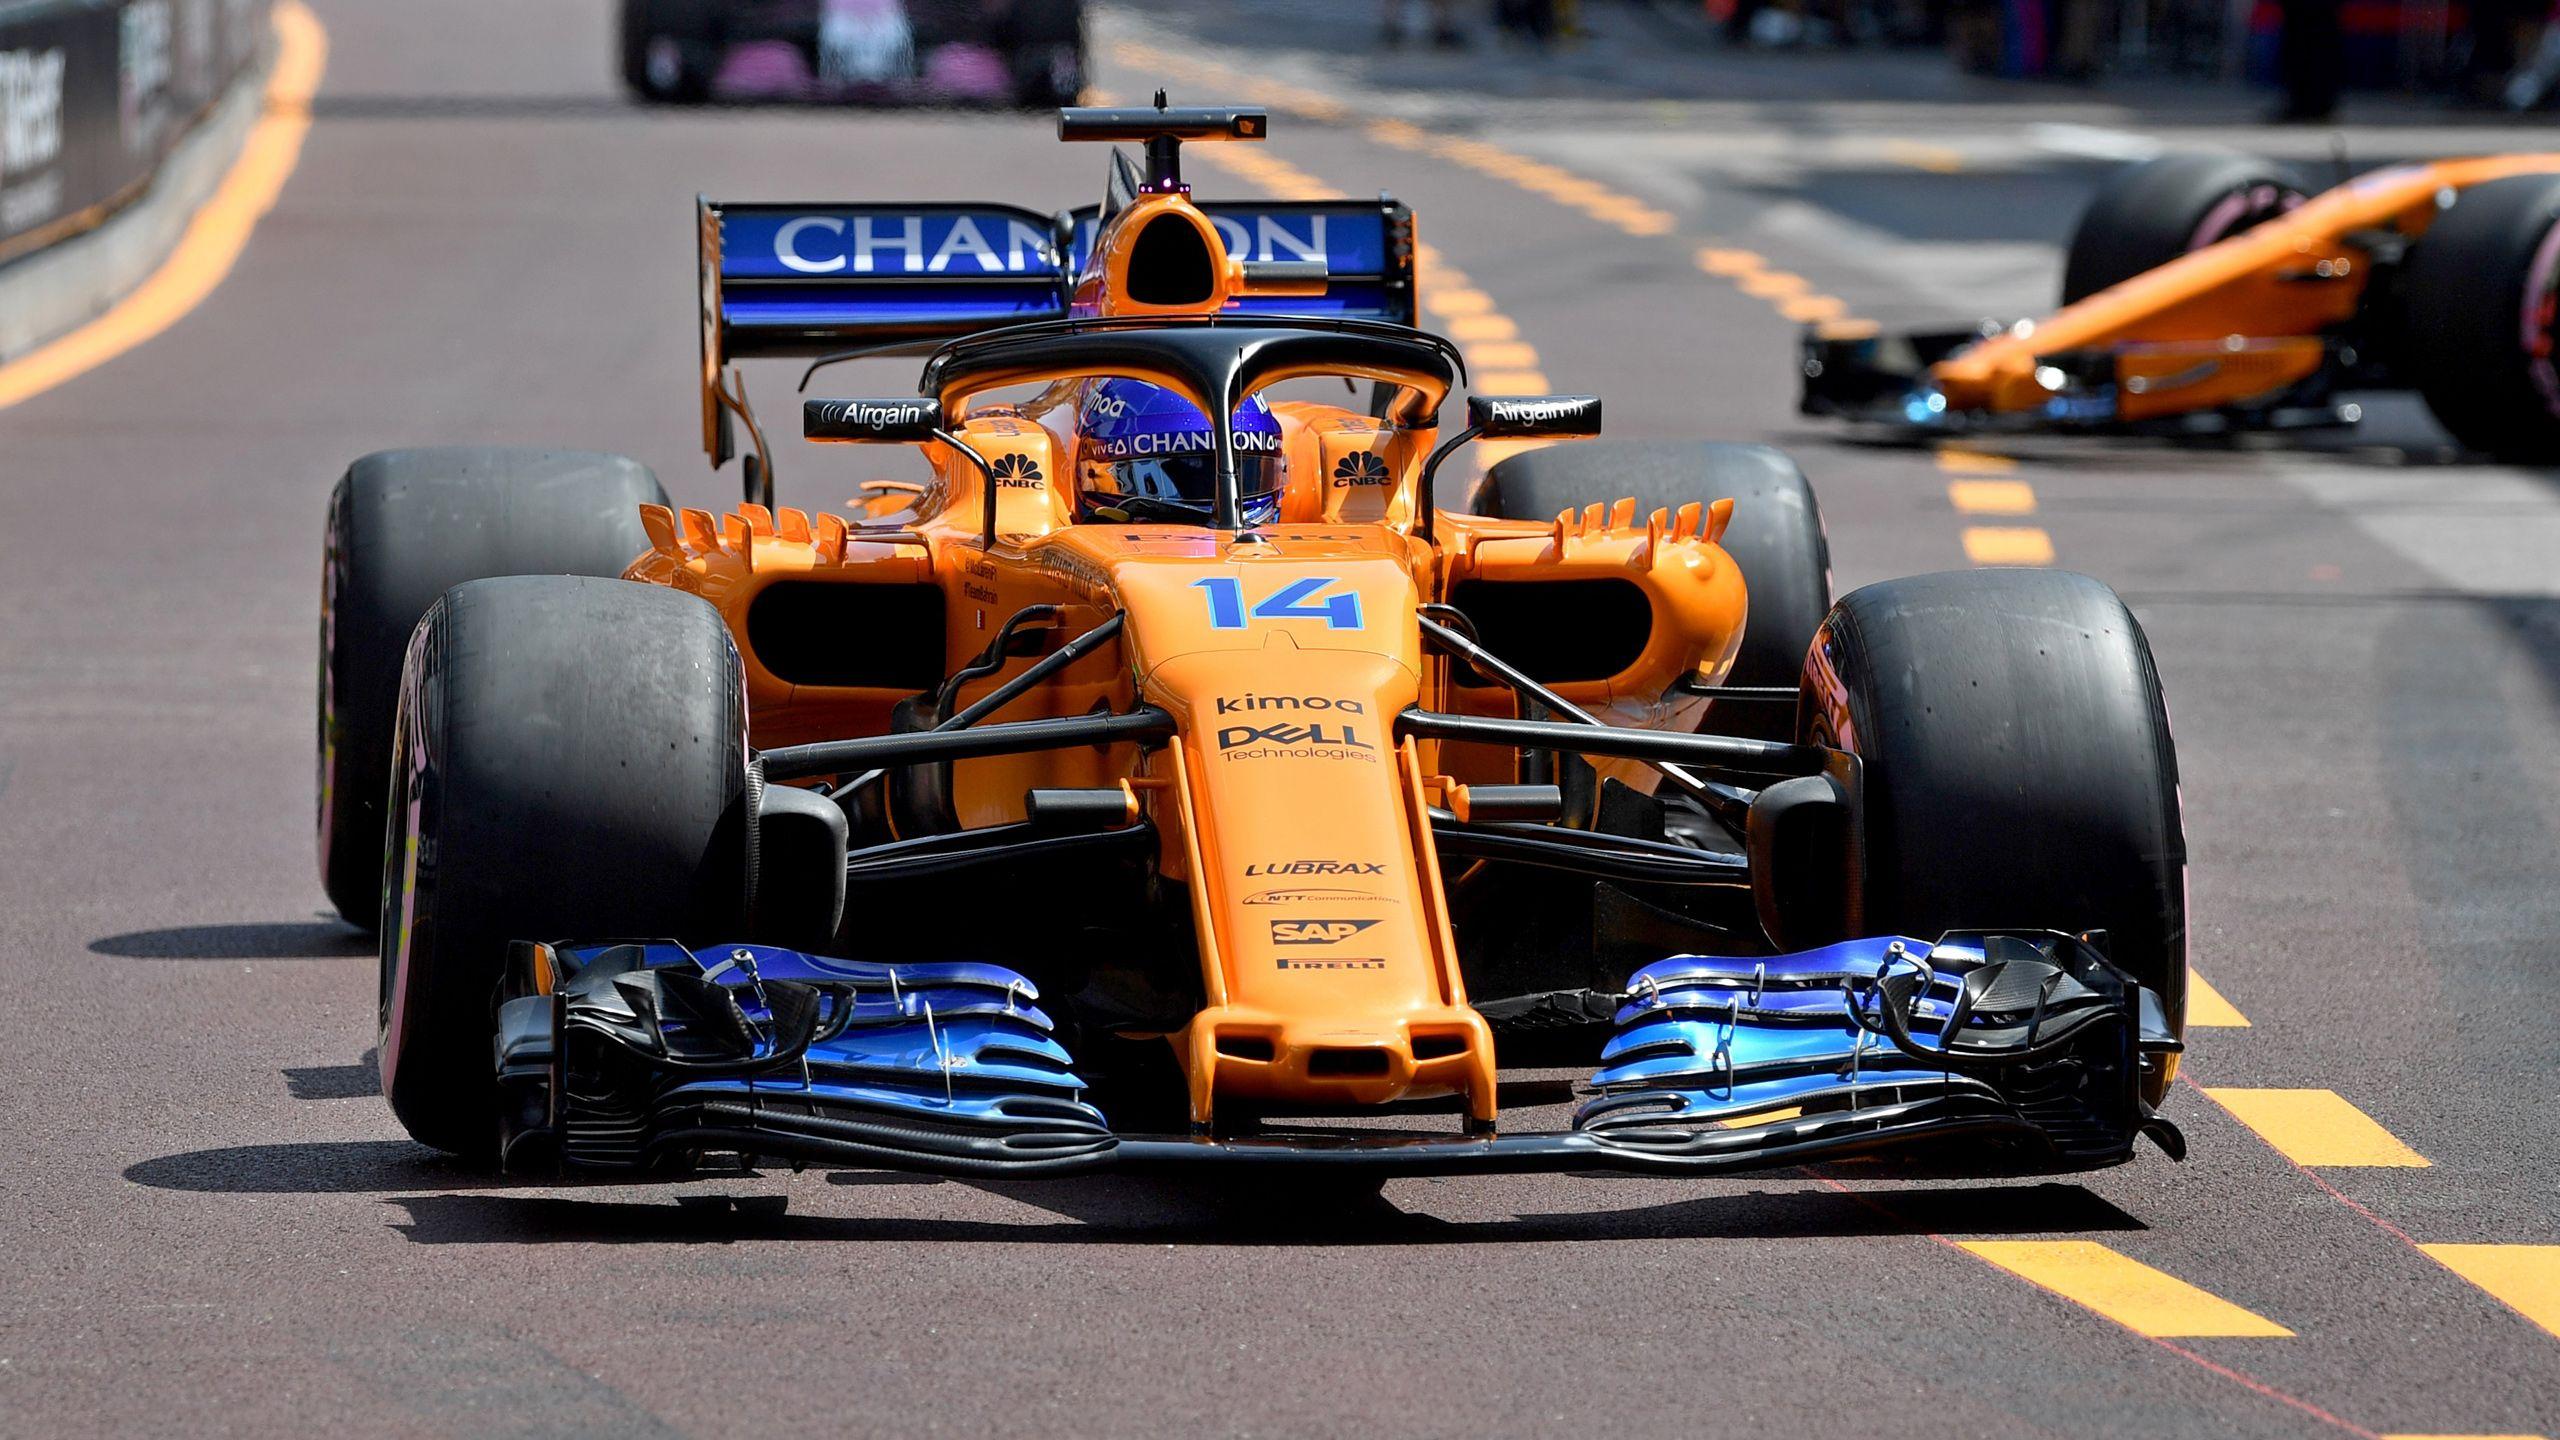 Formula 1 Monaco Grand Prix Practice 3